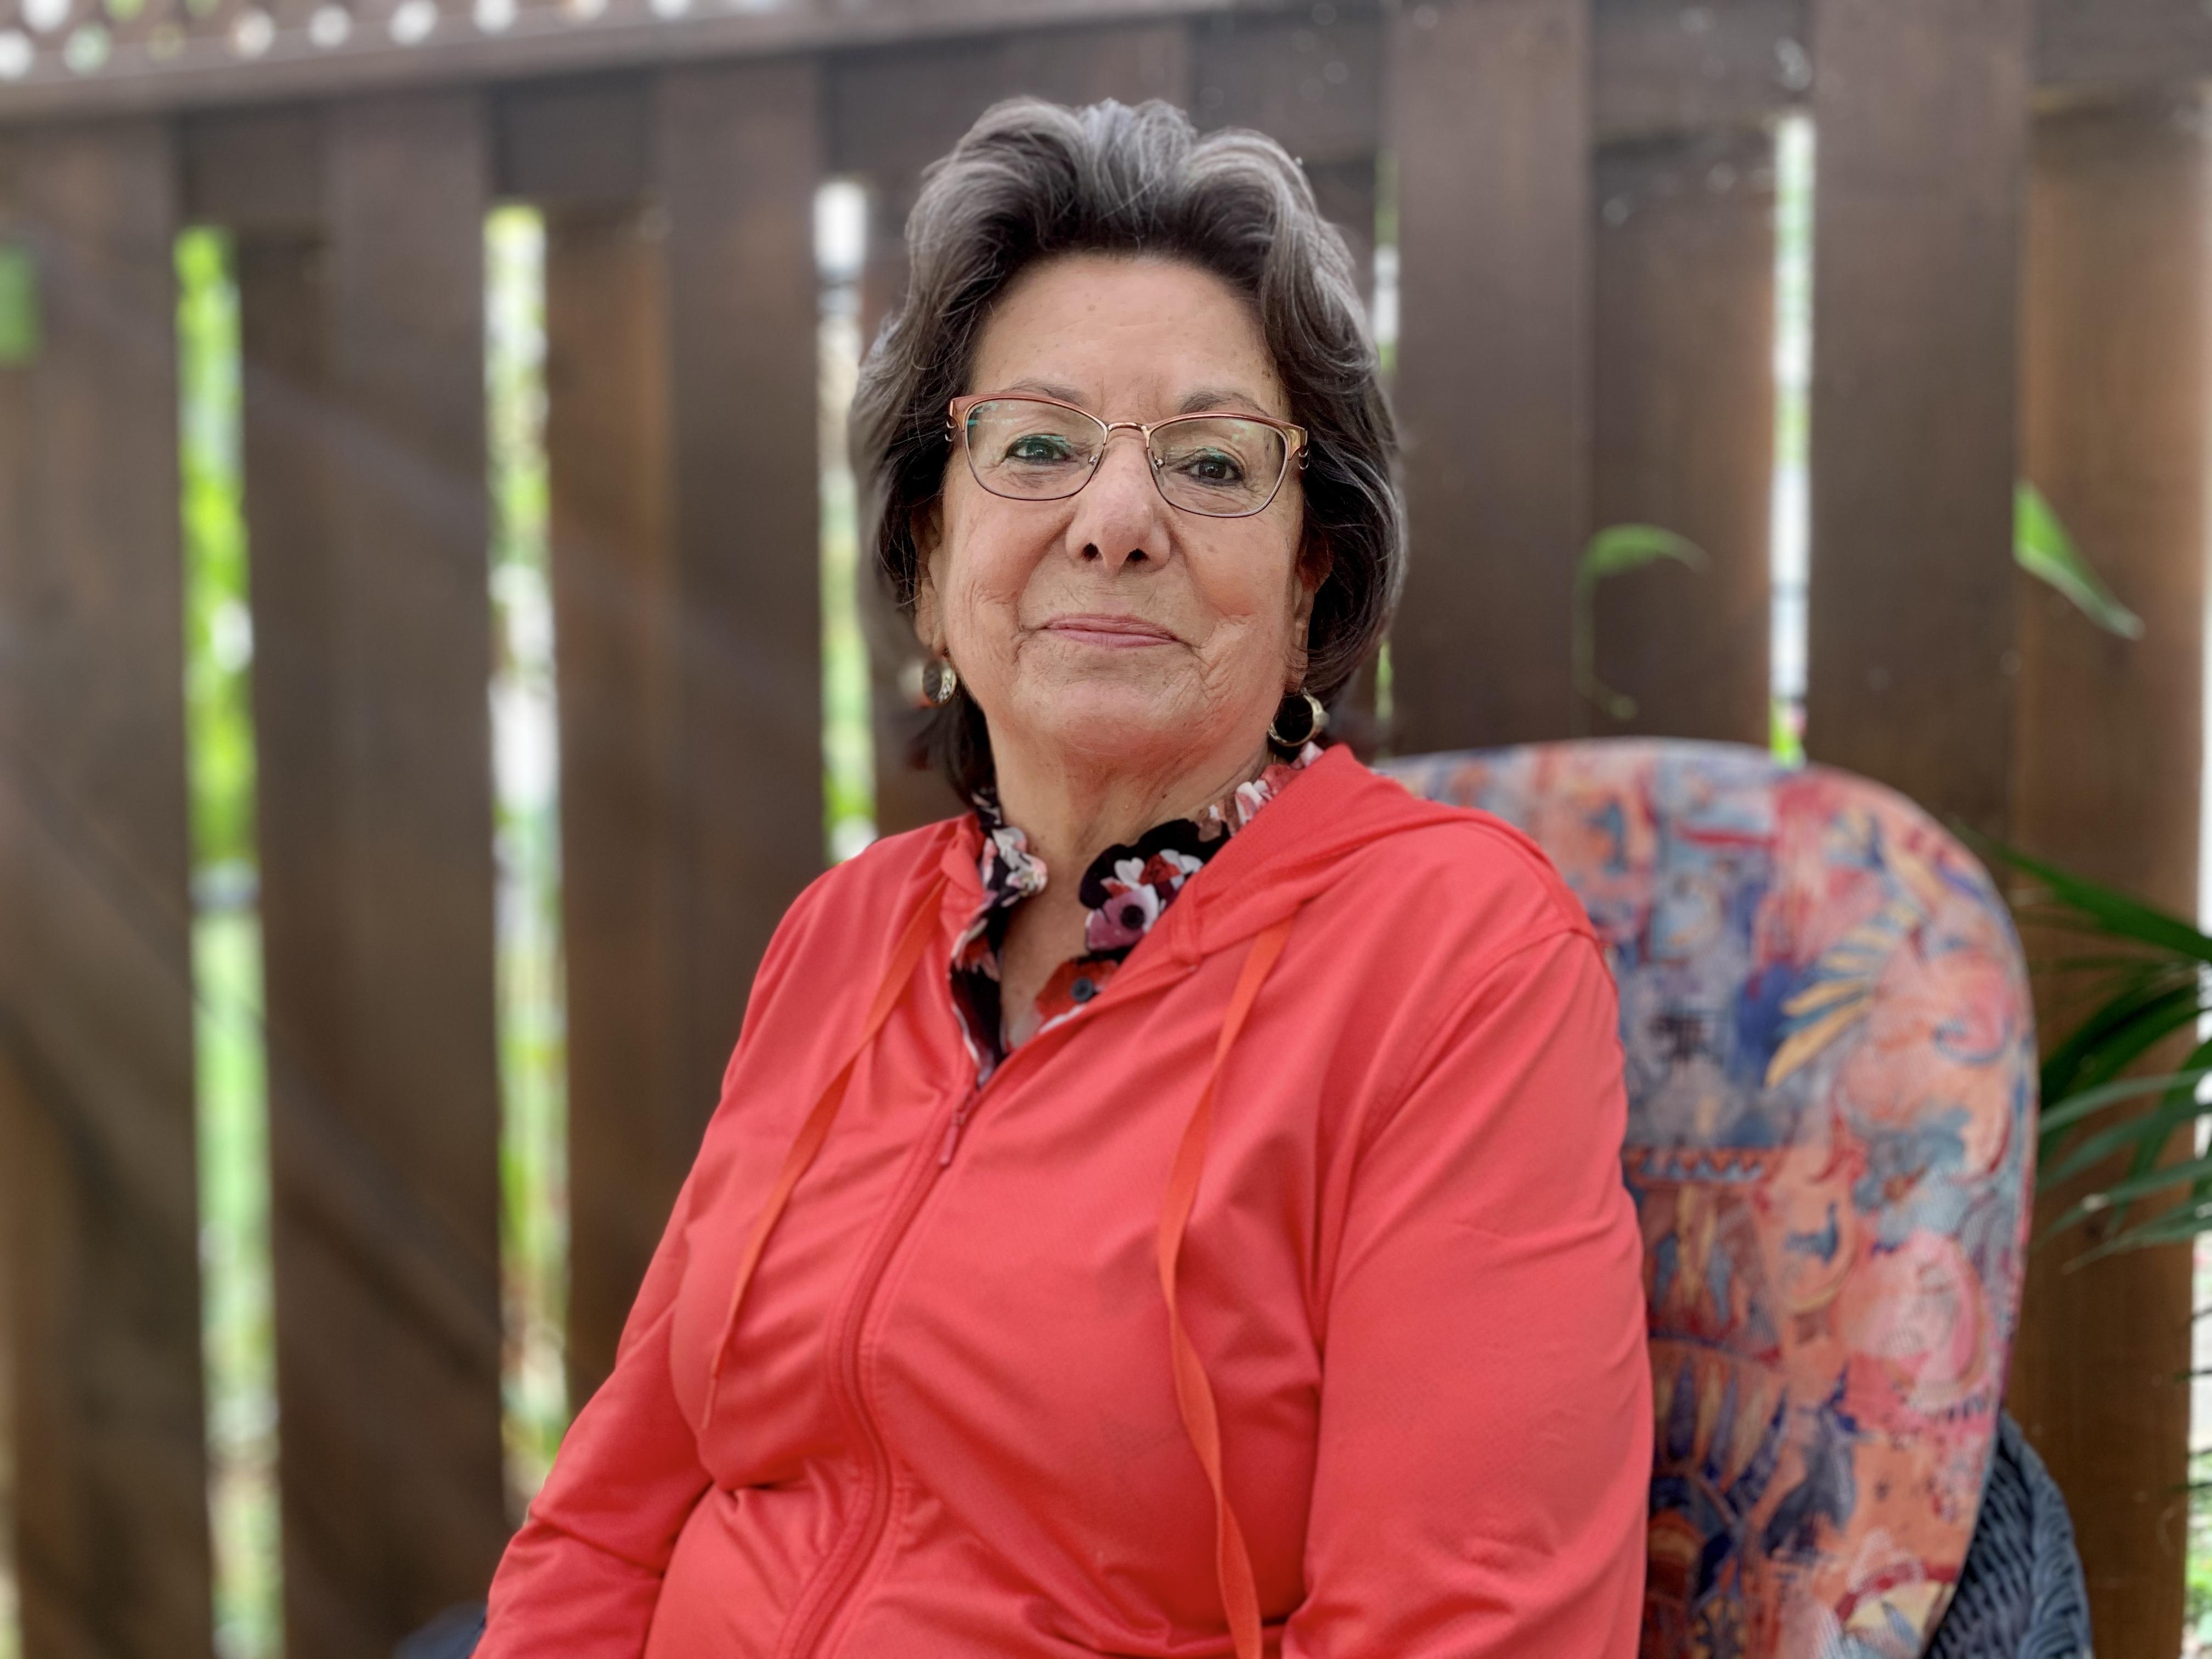 Eva Johnson worked at the Kahnawake Environment Office for 29 years. (Ka'nhehsí:io Deer/CBC)